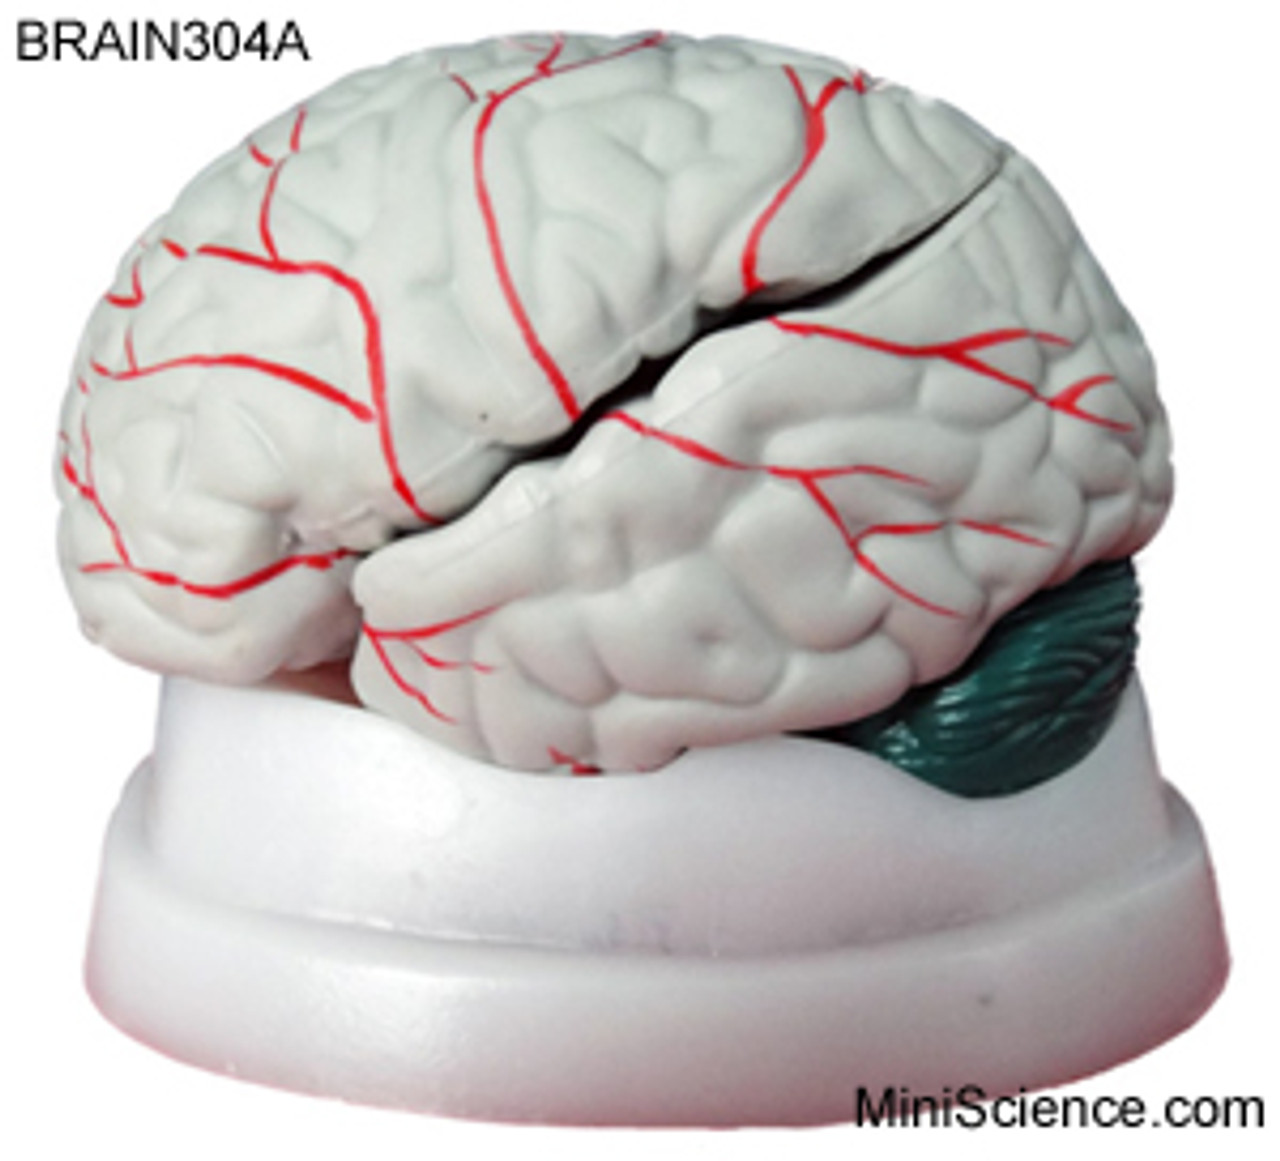 Brain Model with Colored Arteries and Cerebellum